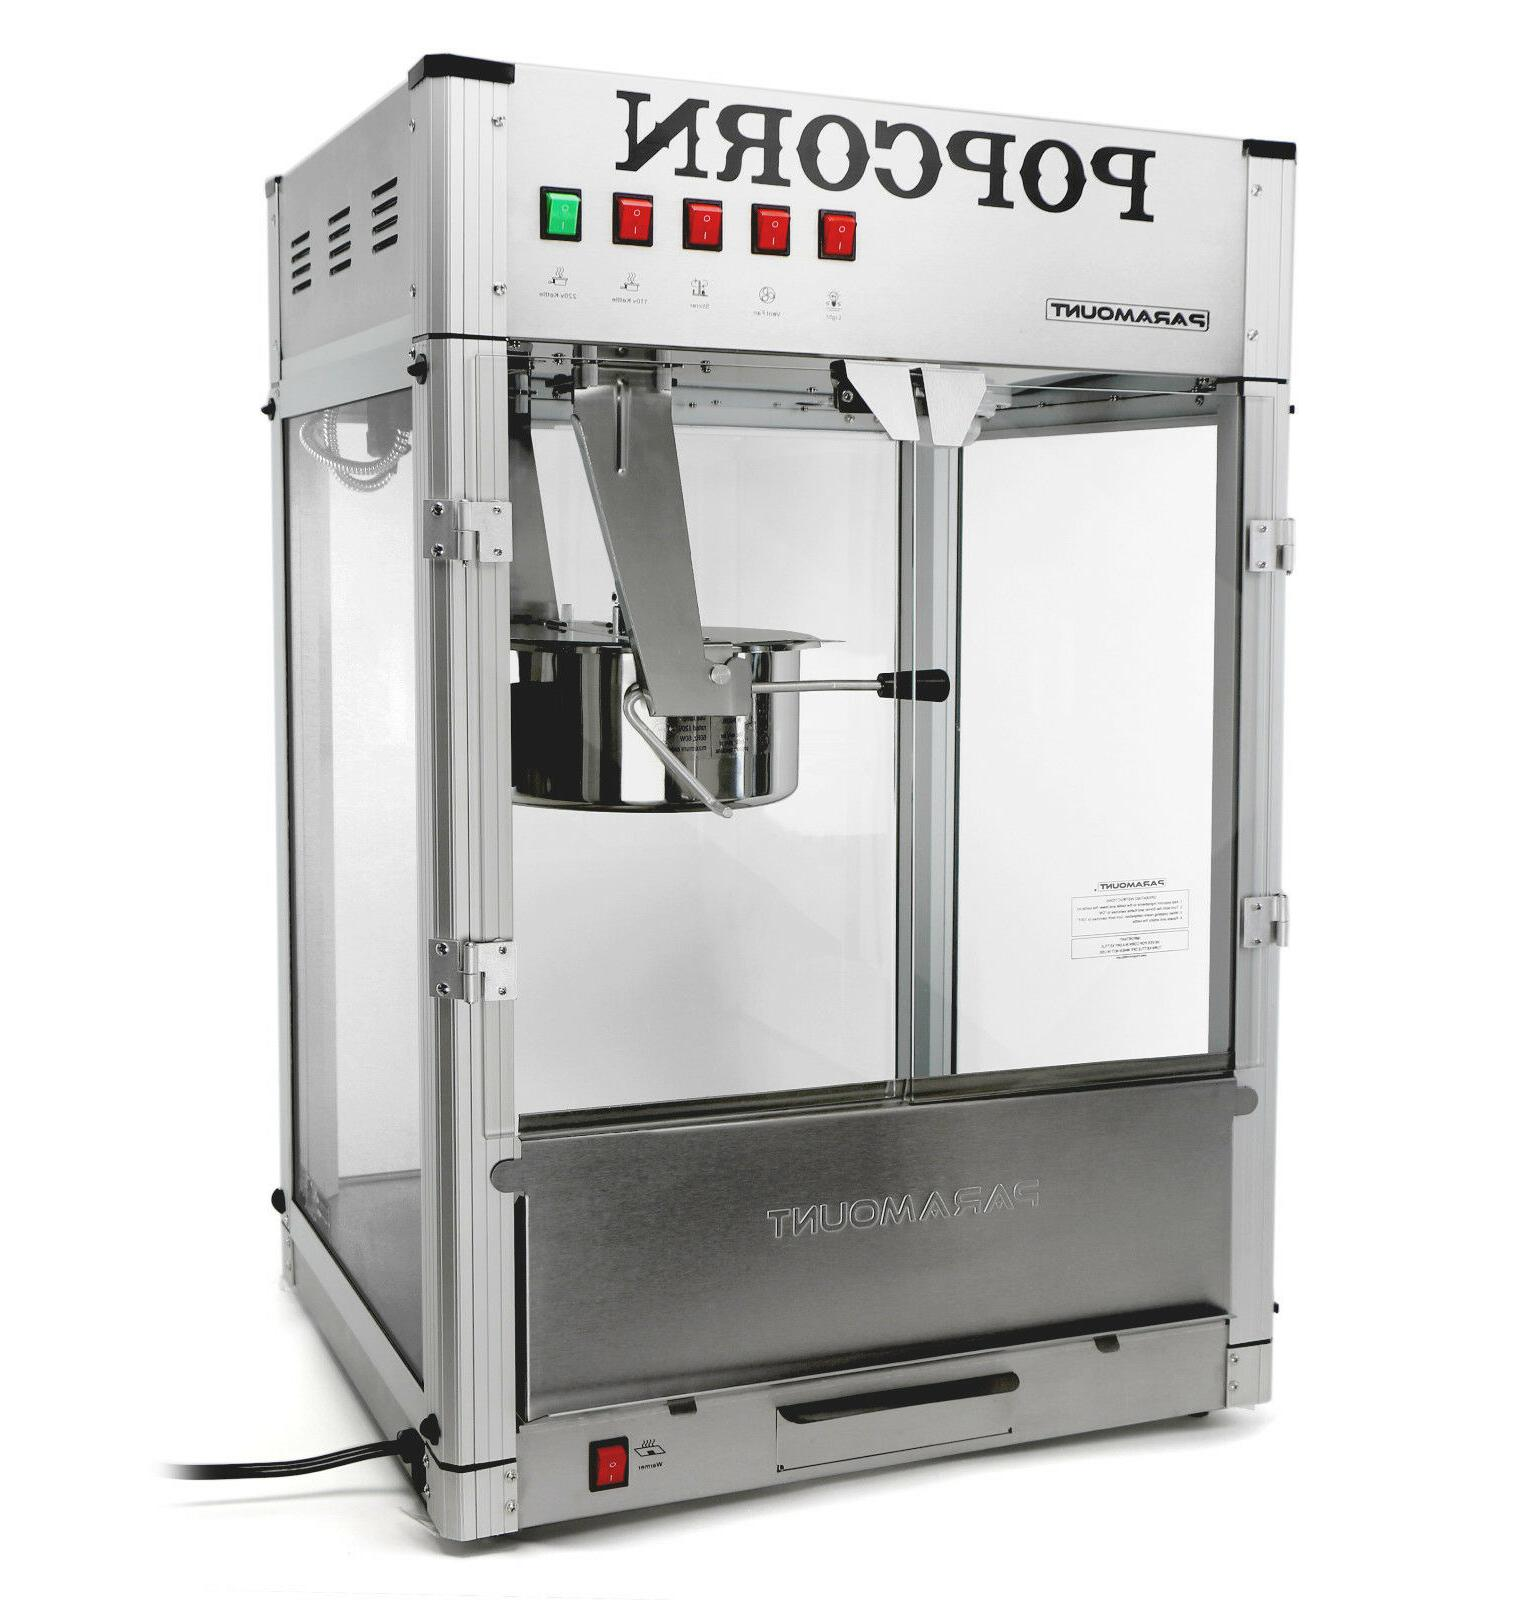 Paramount 20oz Commercial Popcorn Maker Machine Hot